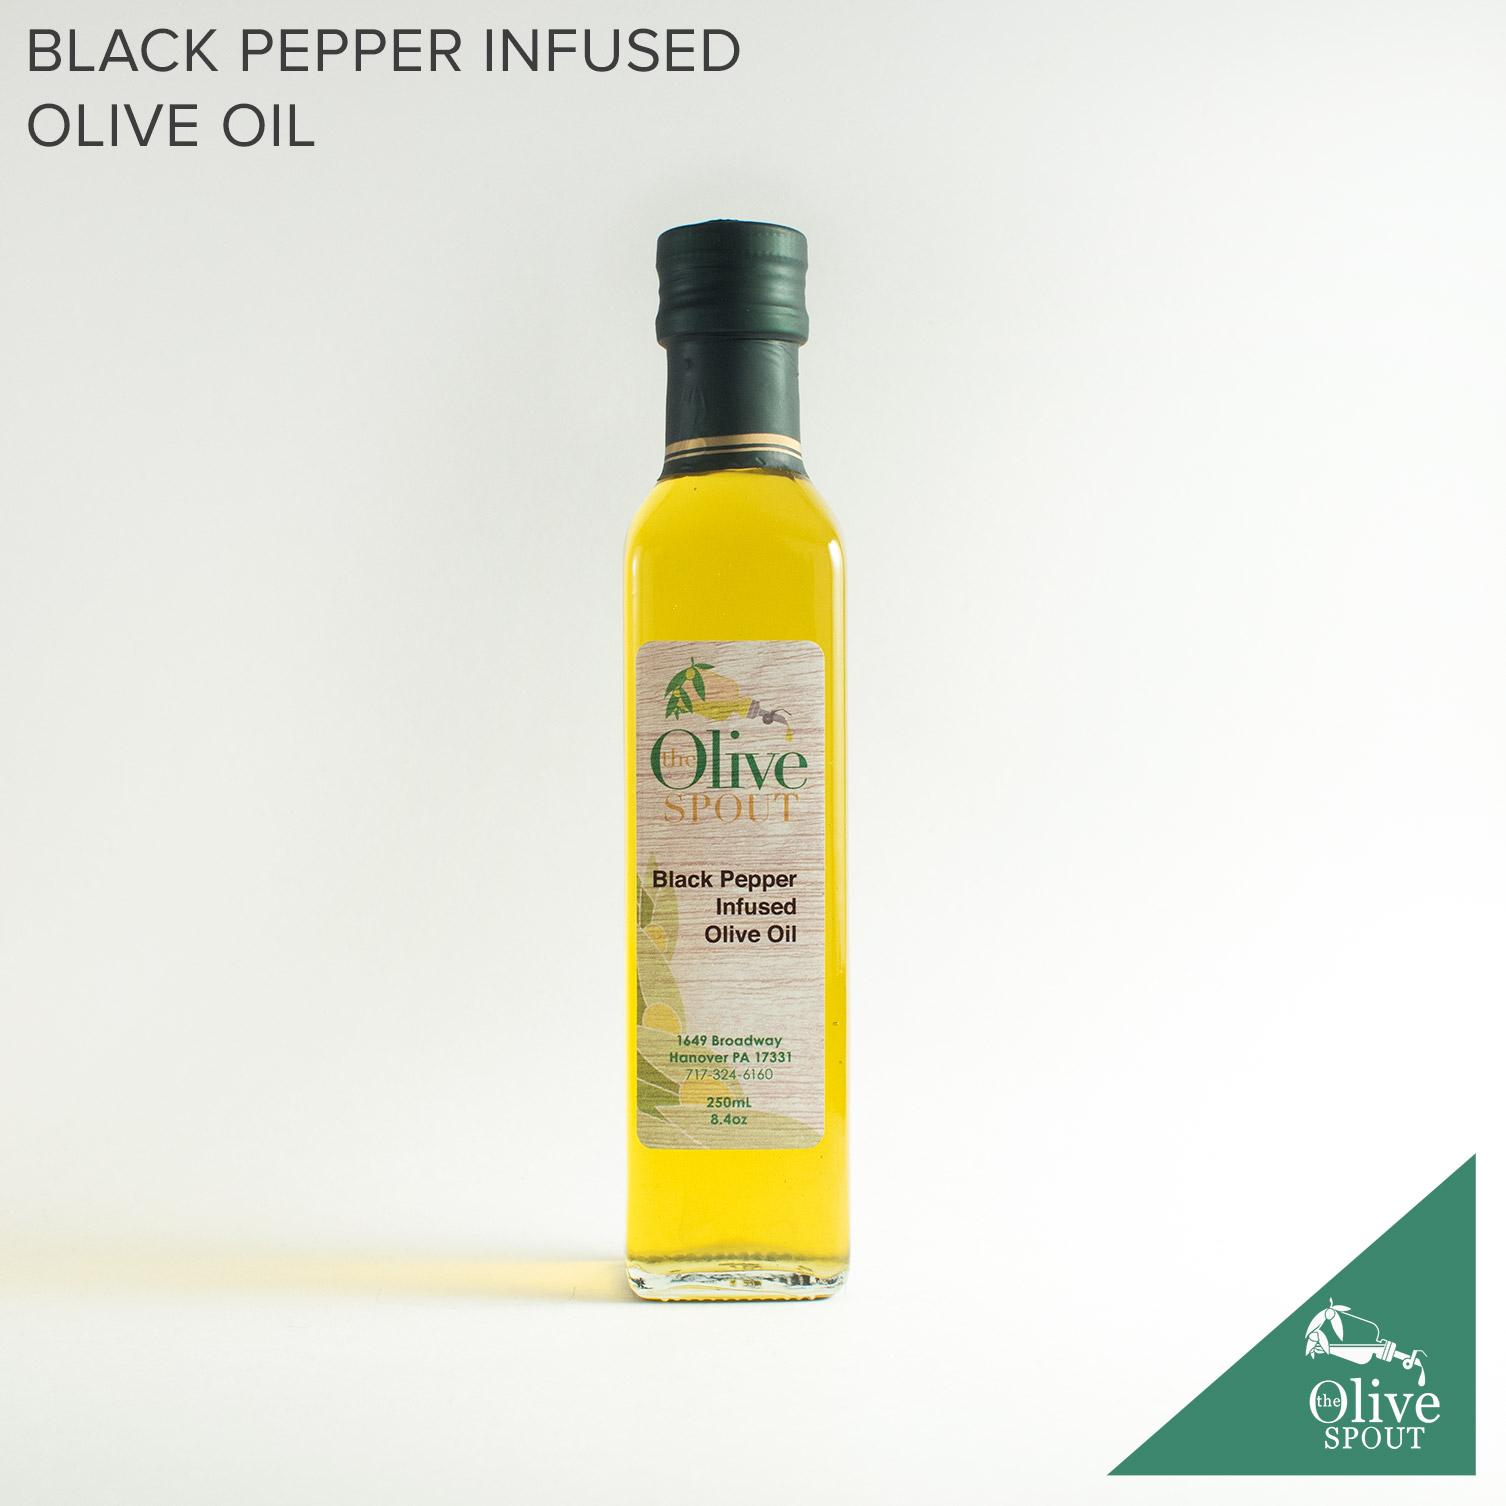 BLACK PEPPER INFUSED OLIVE OIL.jpg